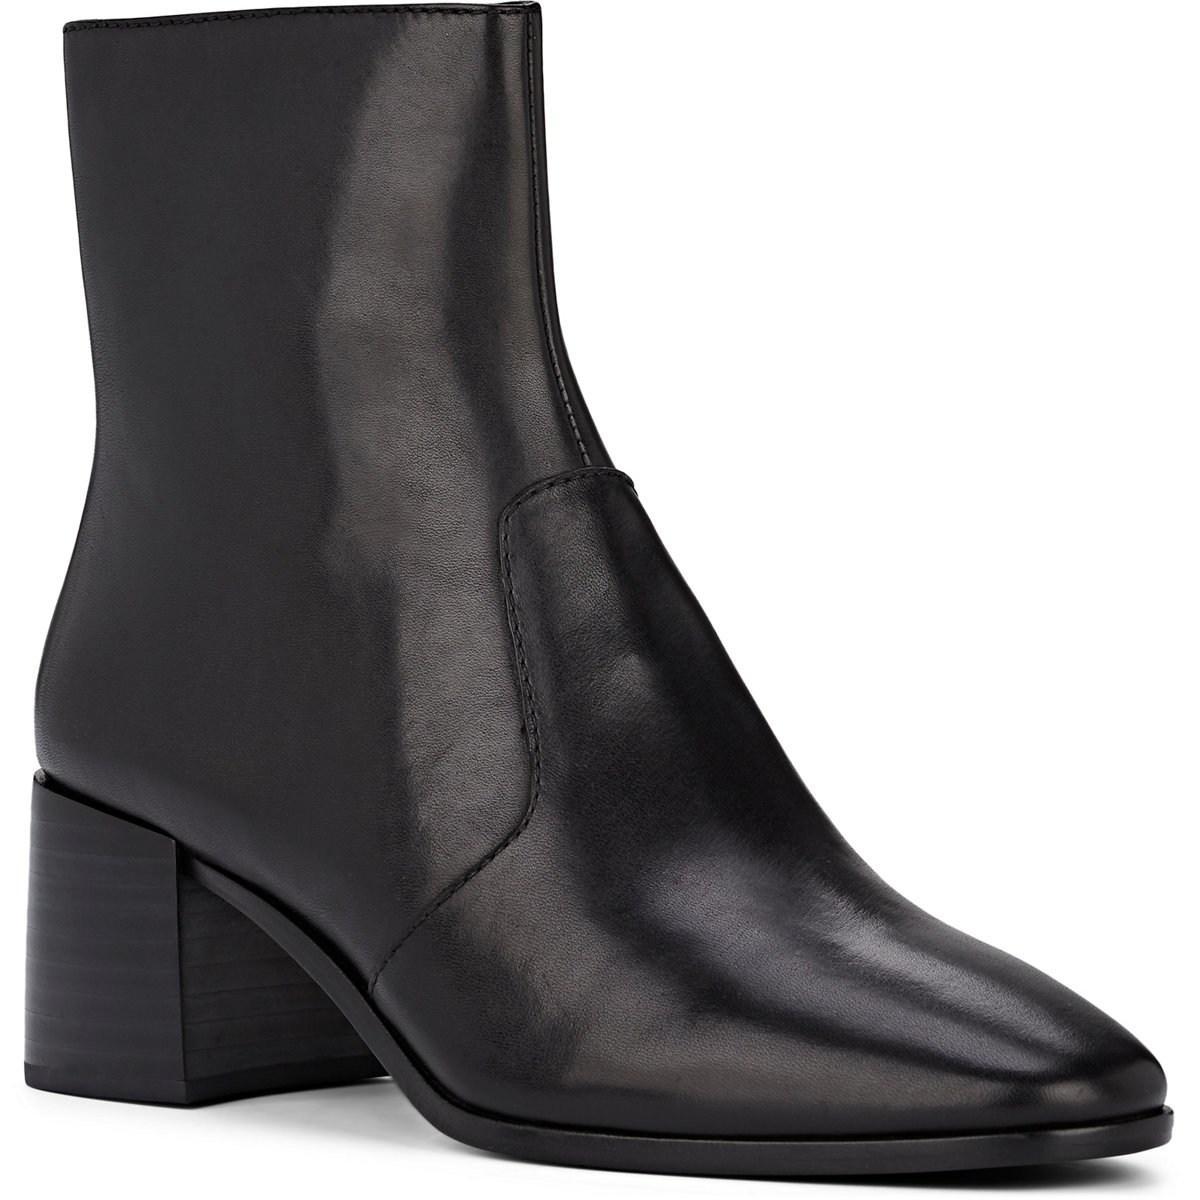 bc280cab8ac3 Loeffler Randall - Black Grant Leather Ankle Boots - Lyst. View fullscreen